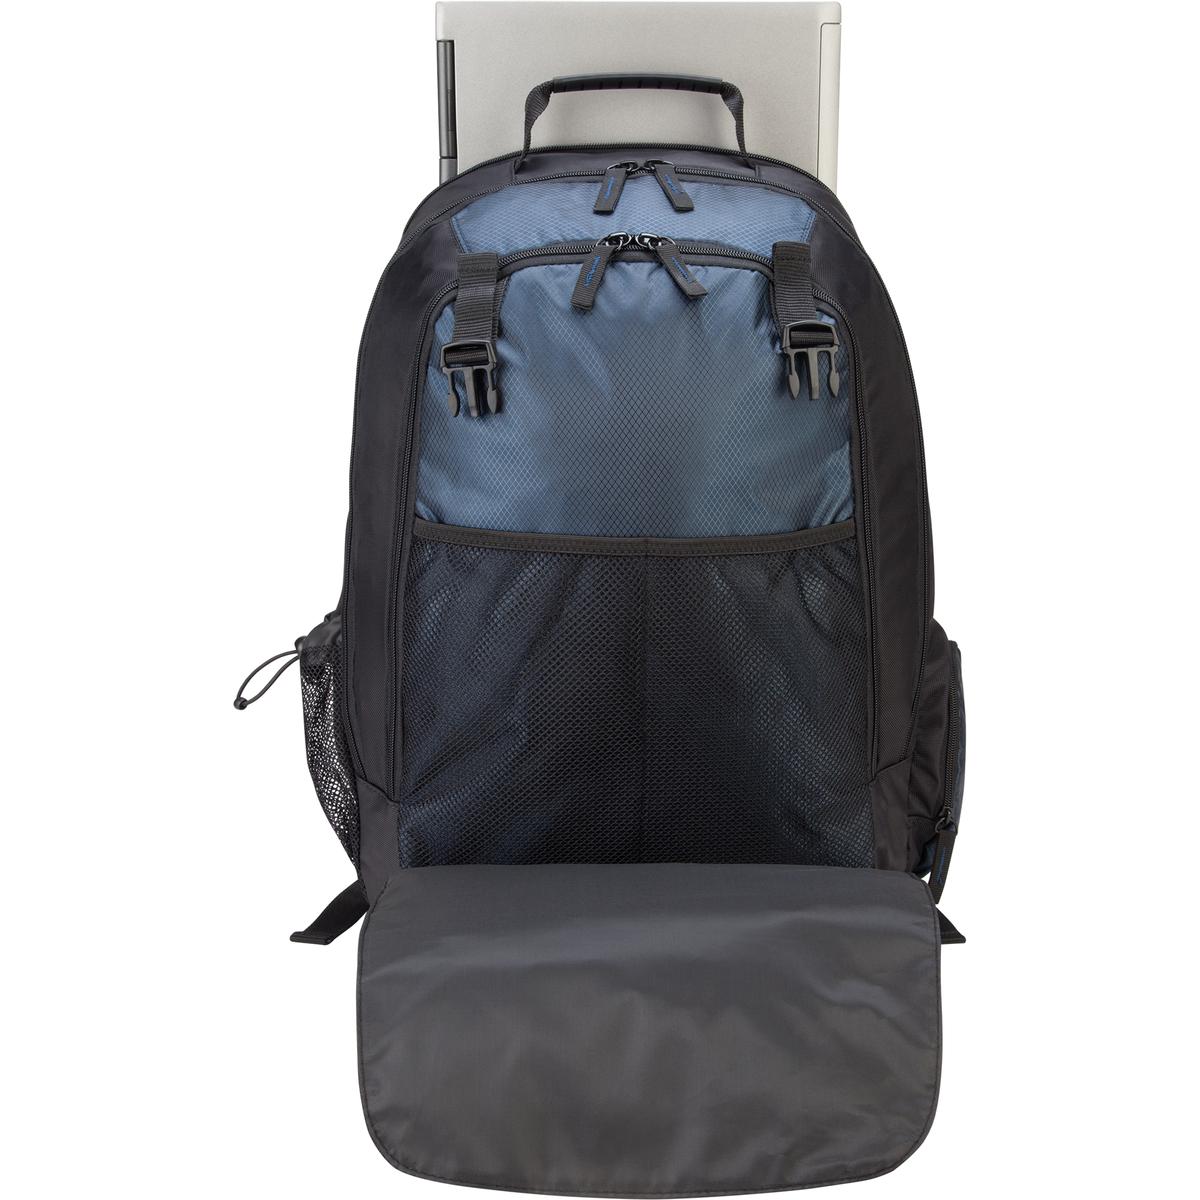 17 Xl Laptop Backpack Txl617 Black Blue Backpacks